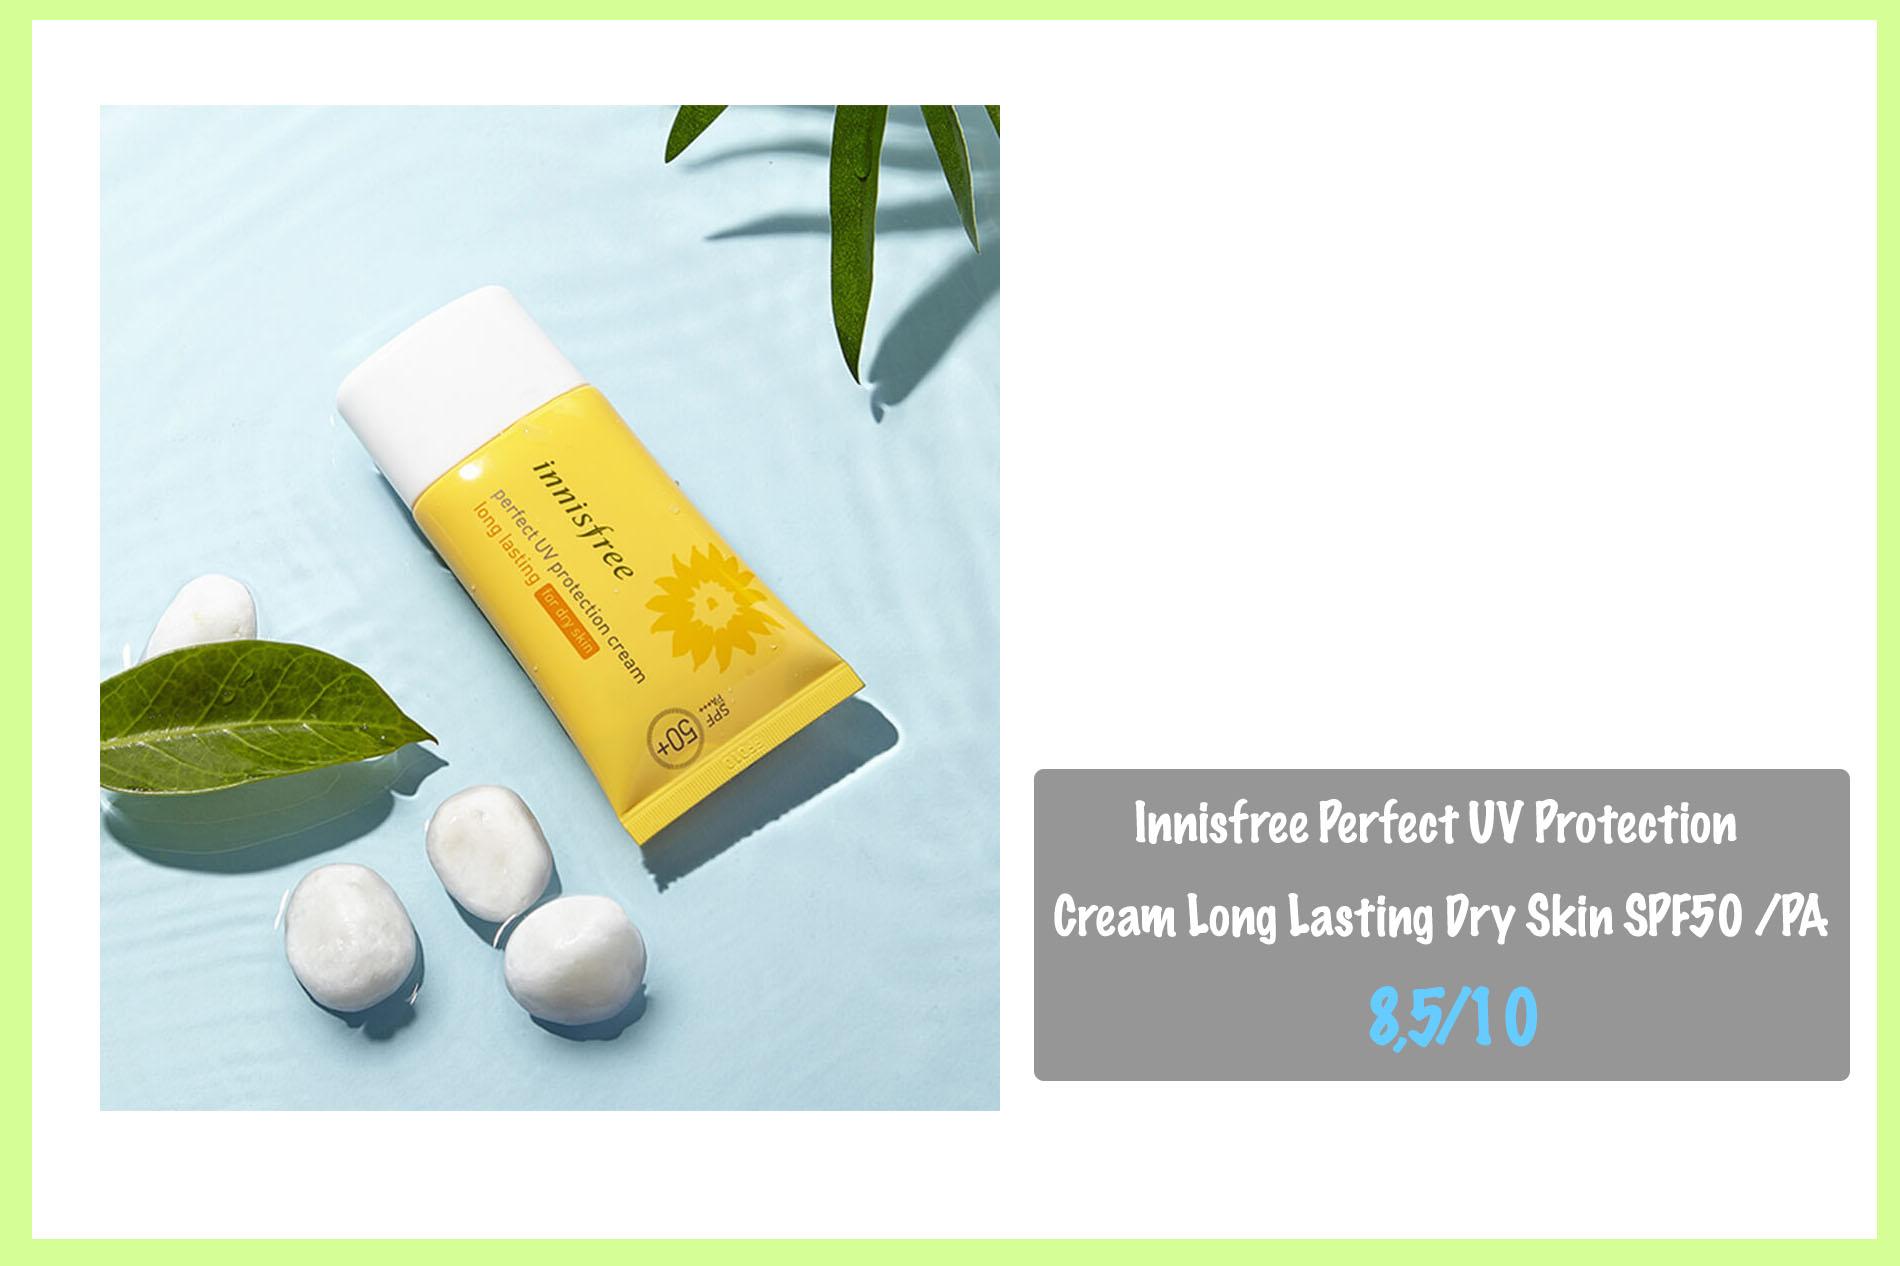 Kem chống nắng cho da khô của Innisfree - Innisfree Perfect UV Protection Cream Long Lasting Dry Skin SPF50 /PA